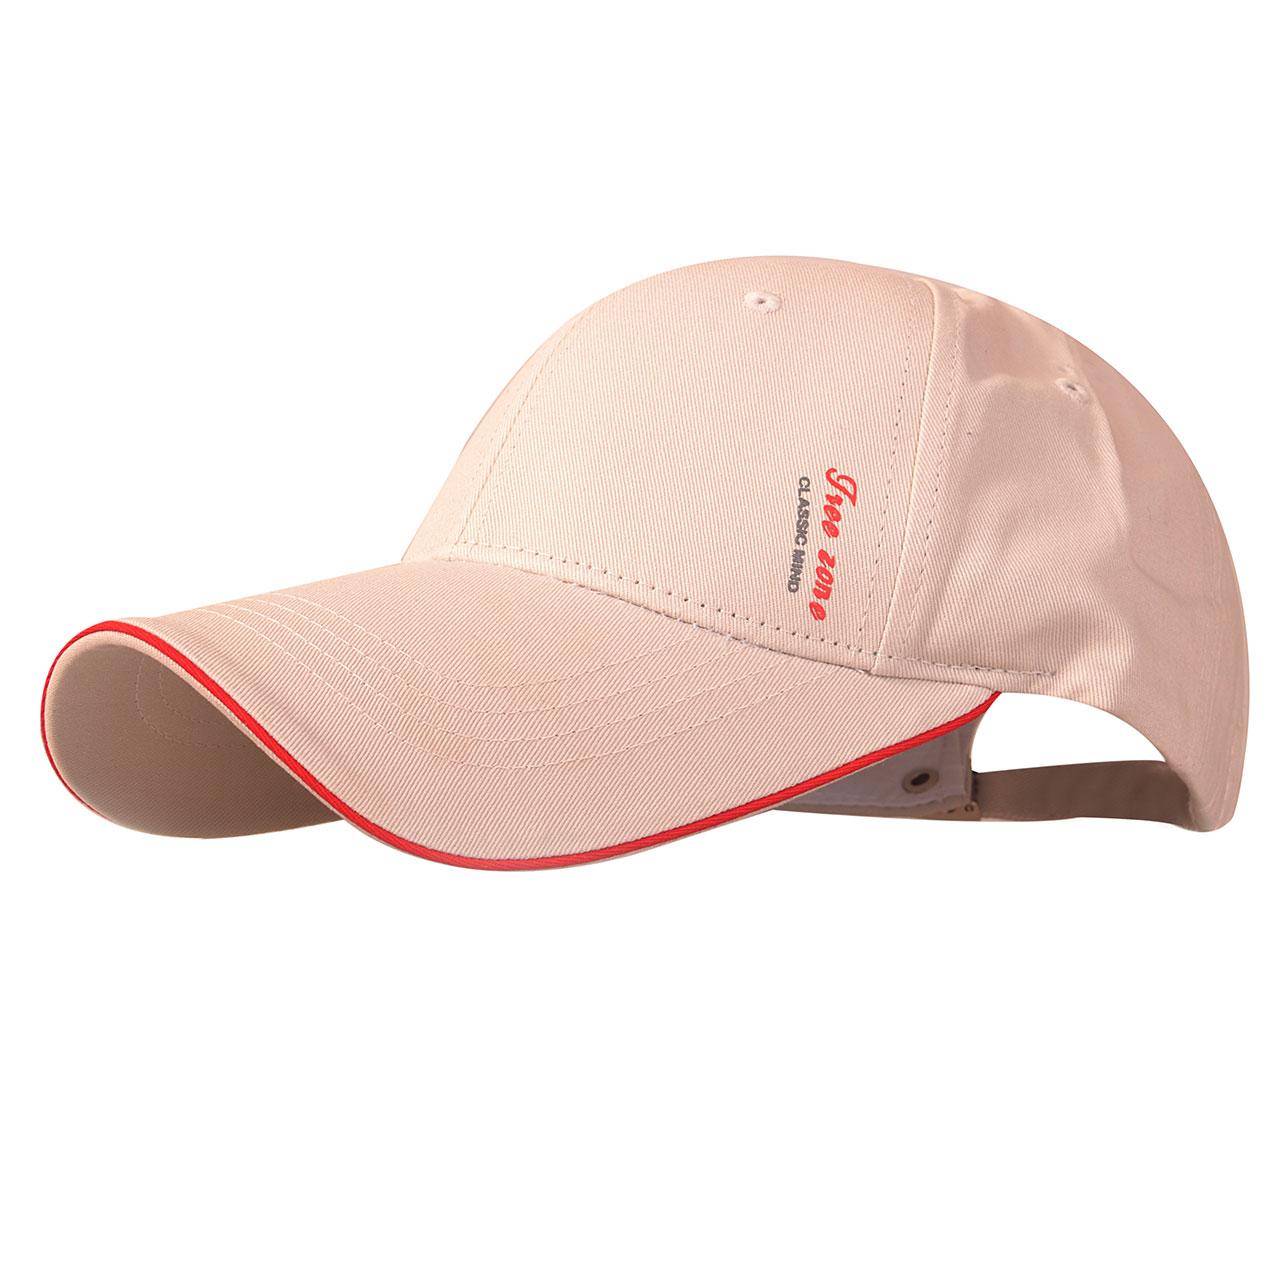 قیمت کلاه کپ مدل PZ140